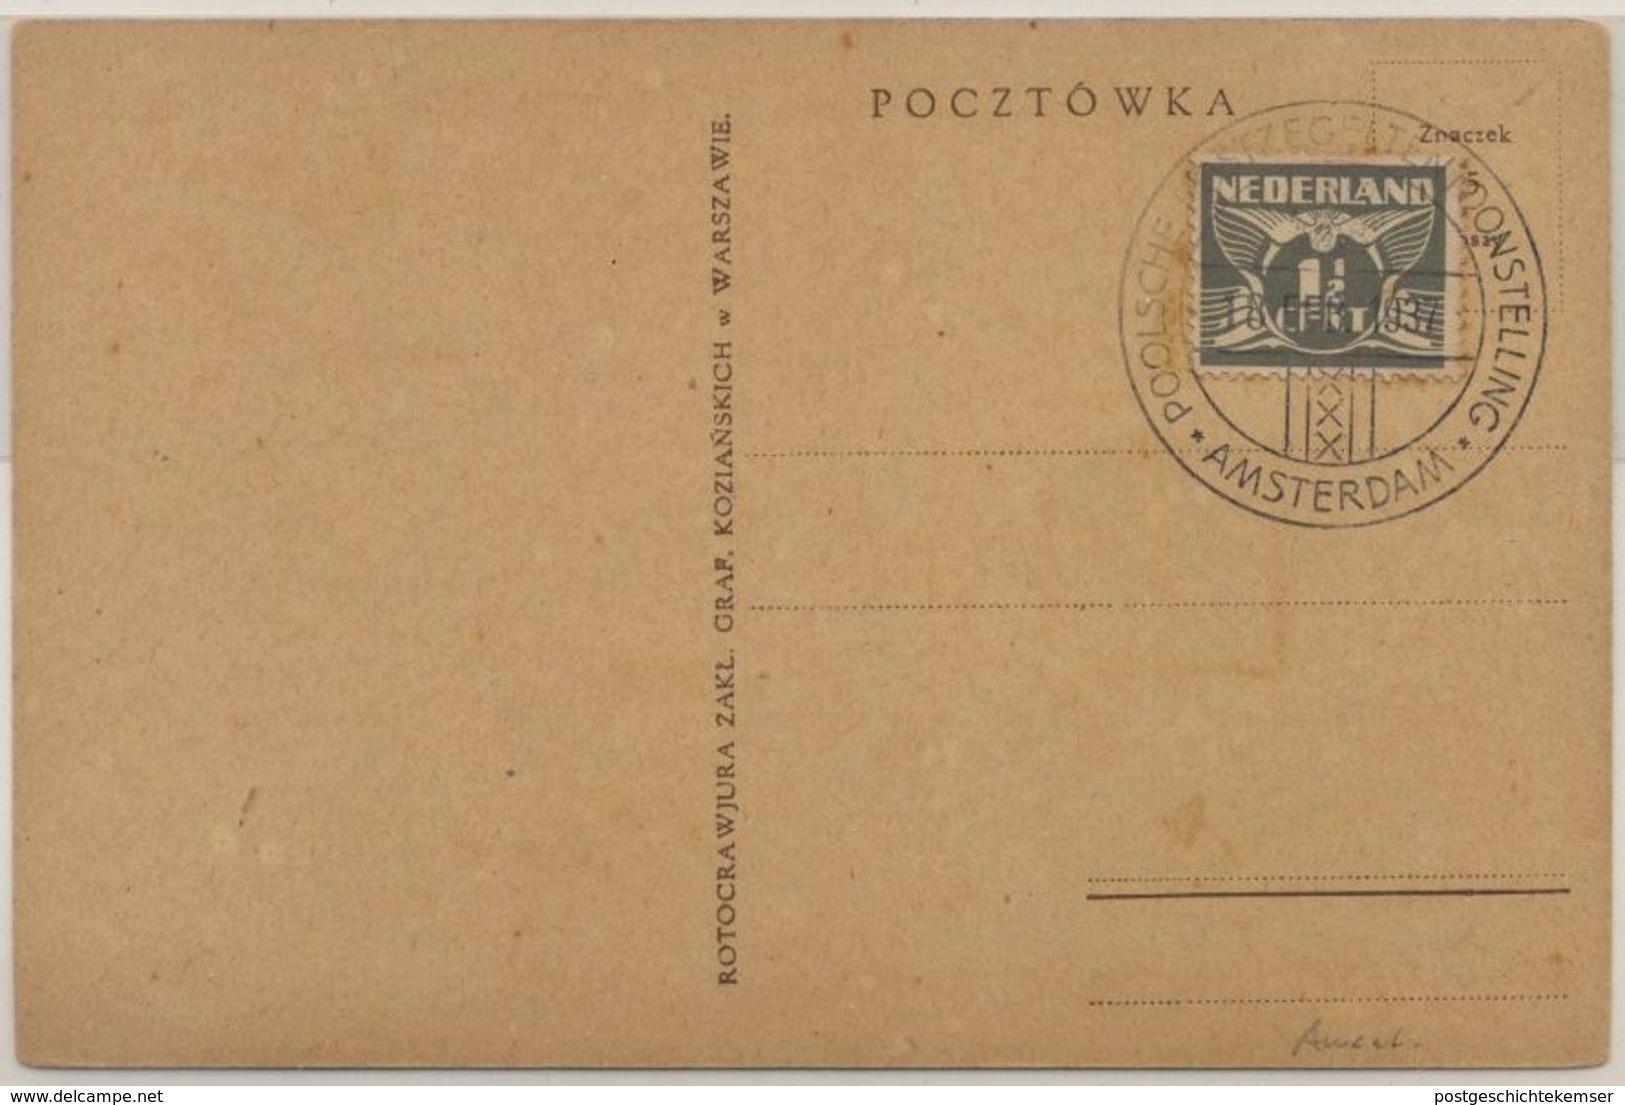 Niederlande/Polen - Pilsudskiemo Sonderkarte M. Niederl. SST Amsterdam 1937 - Pays-Bas